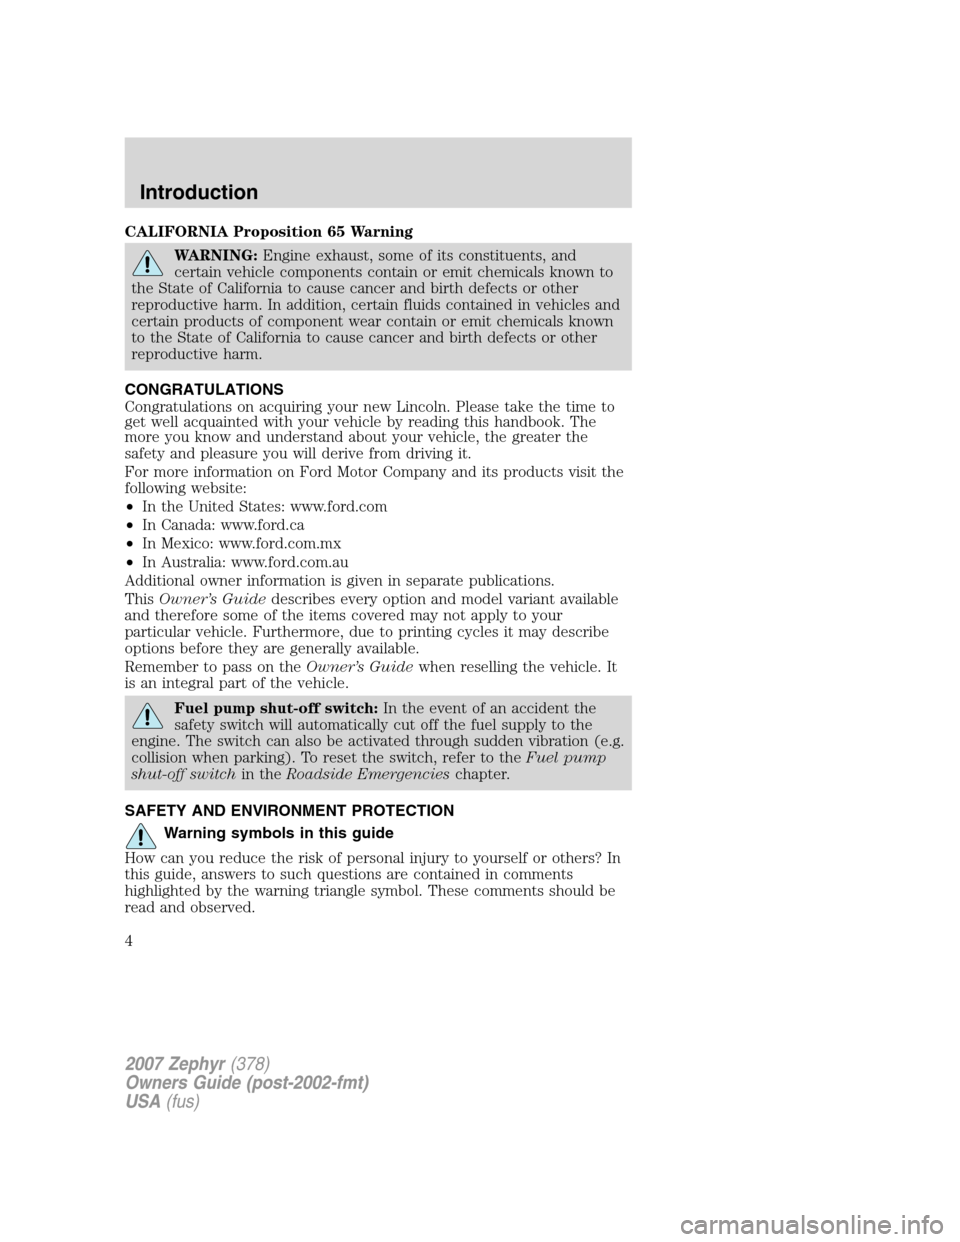 lincoln mkz 2007 owners manual rh carmanualsonline info 2010 lincoln mkz owners manual pdf 2007 lincoln mkz owner's manual pdf